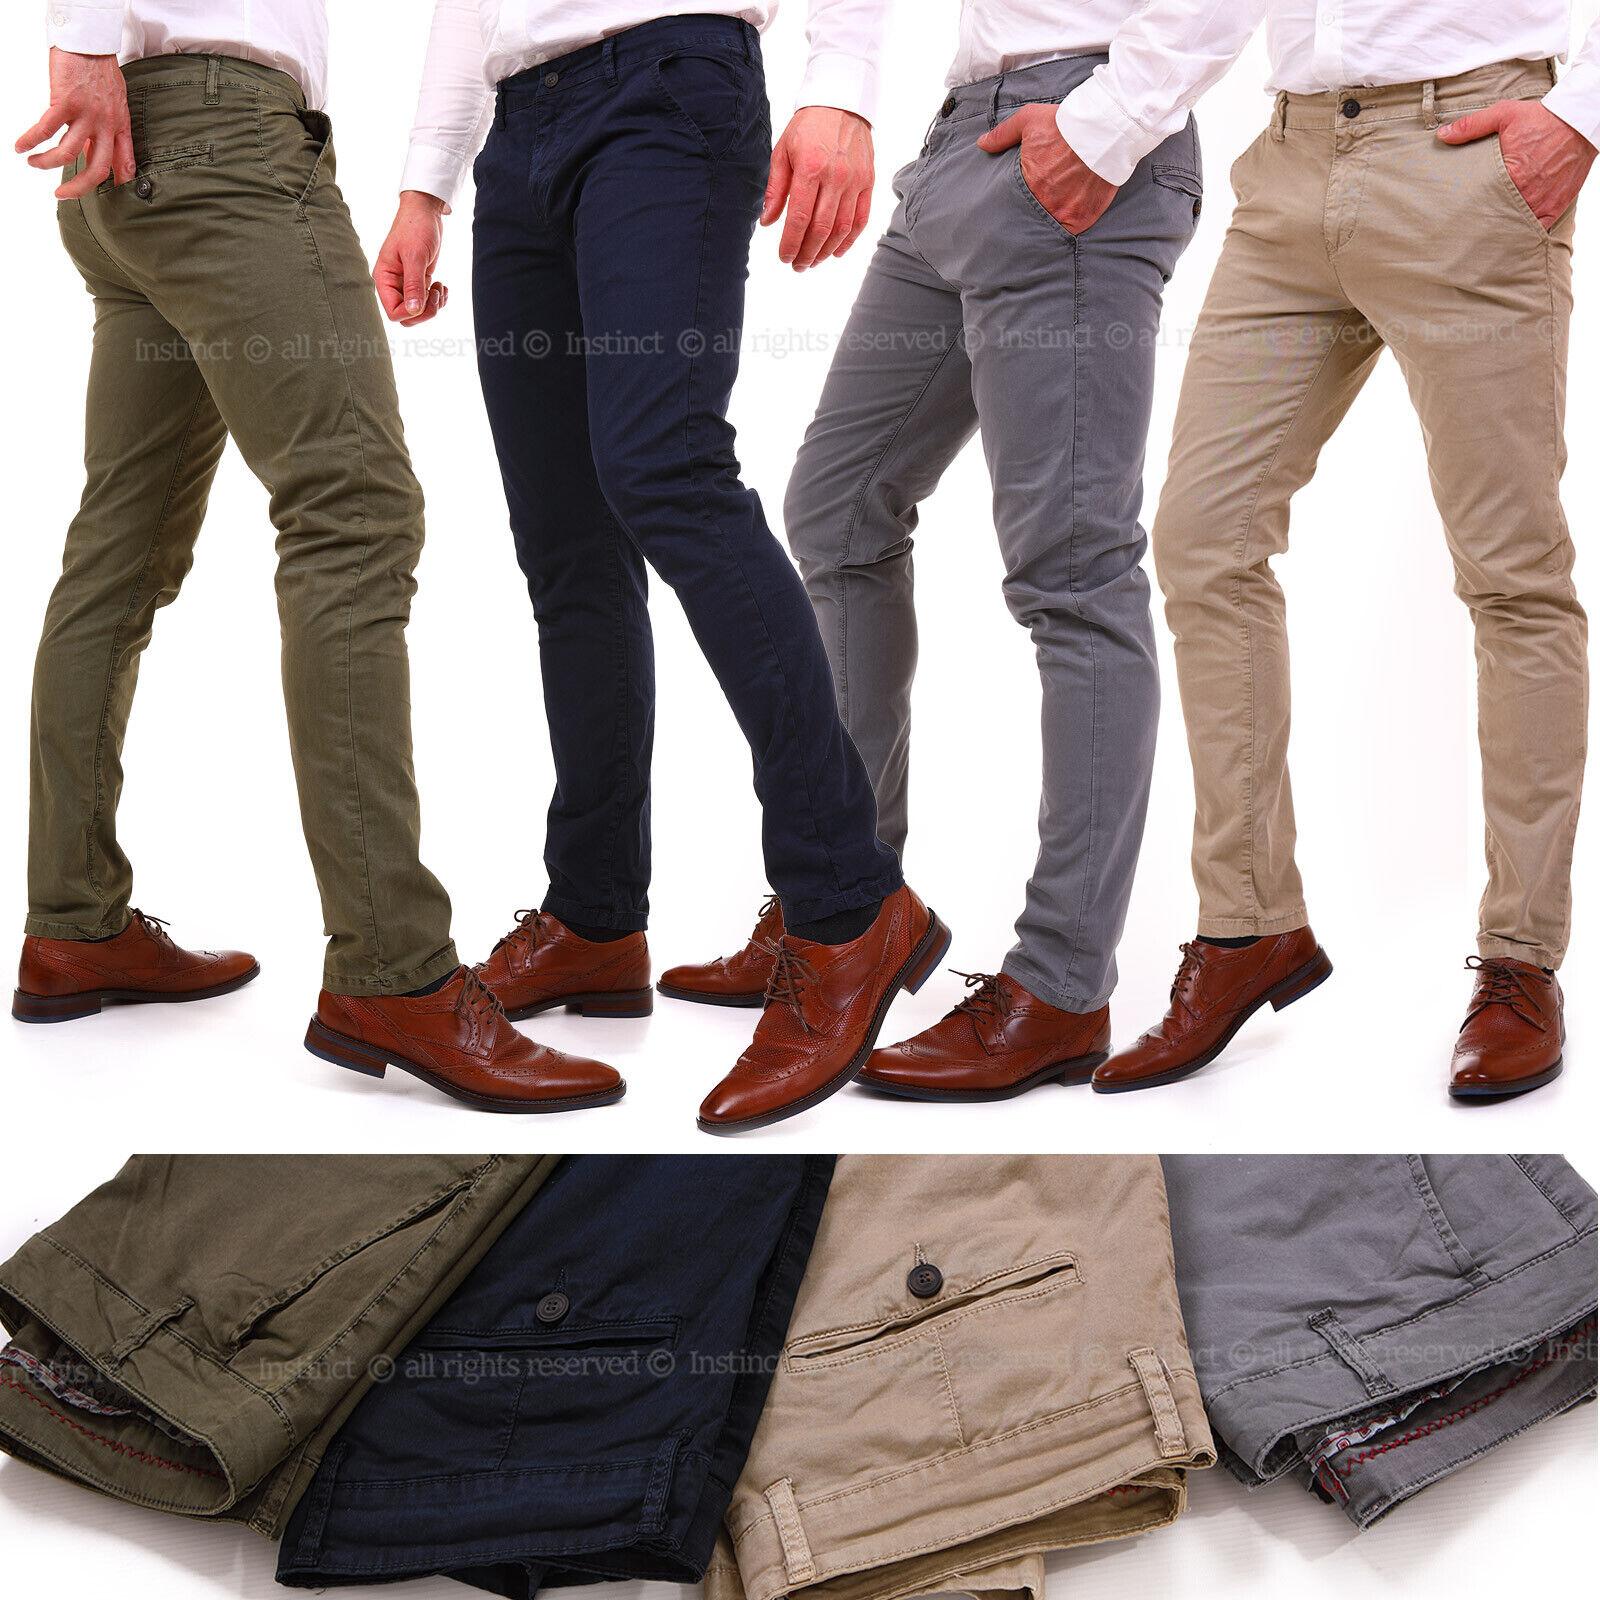 Pantaloni da uomo chino slim fit elasticizzati eleganti invernali eleganti 54 56